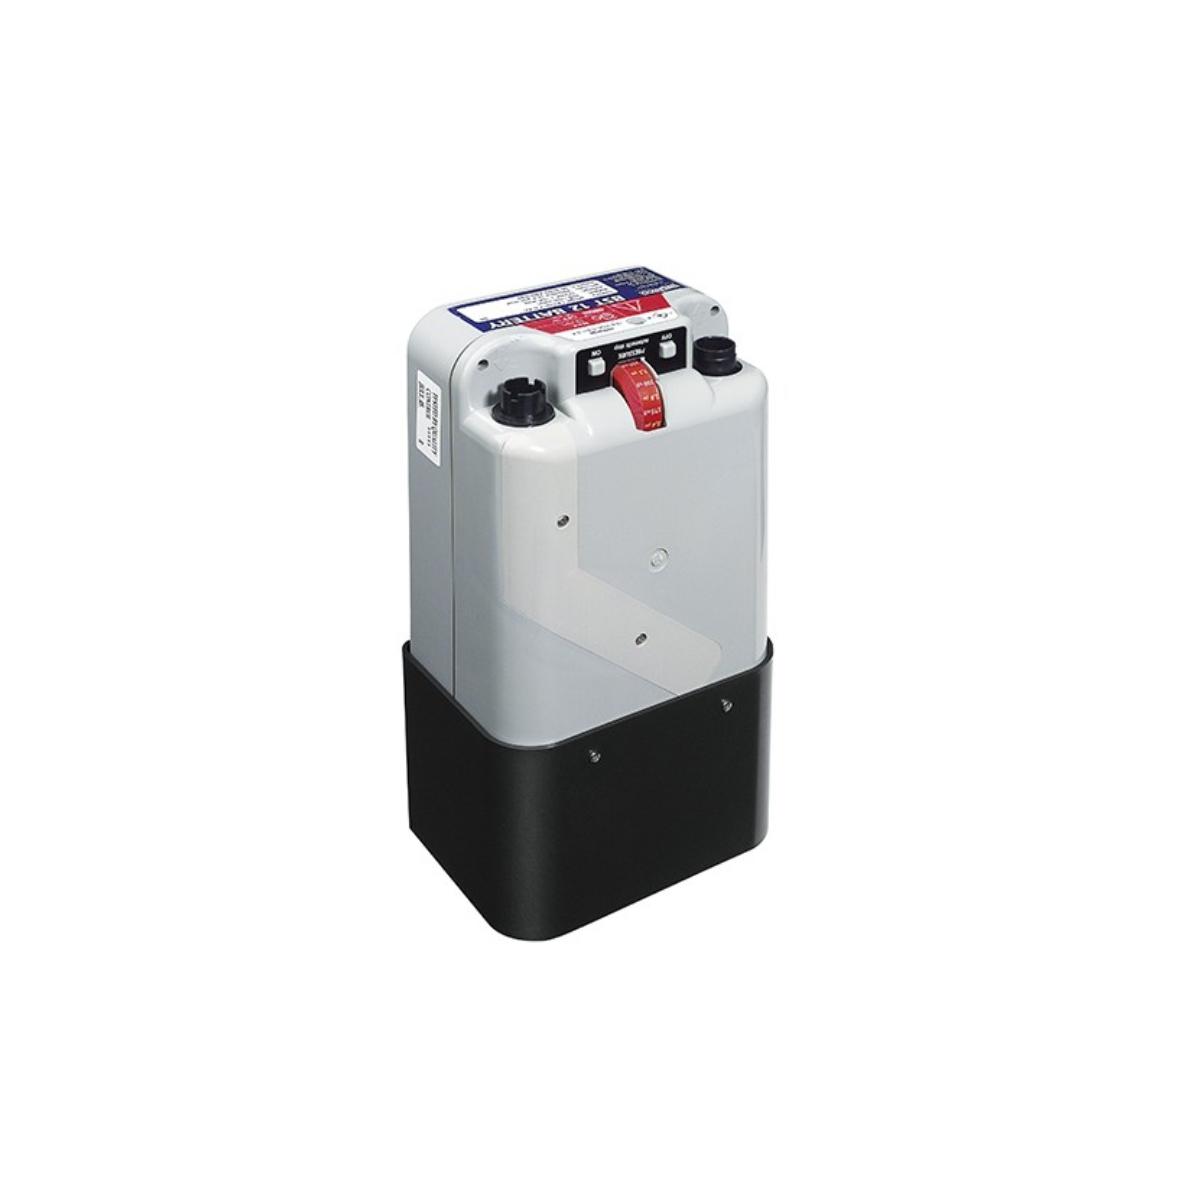 SUPER TURBO ELECTRIC INFLATORS